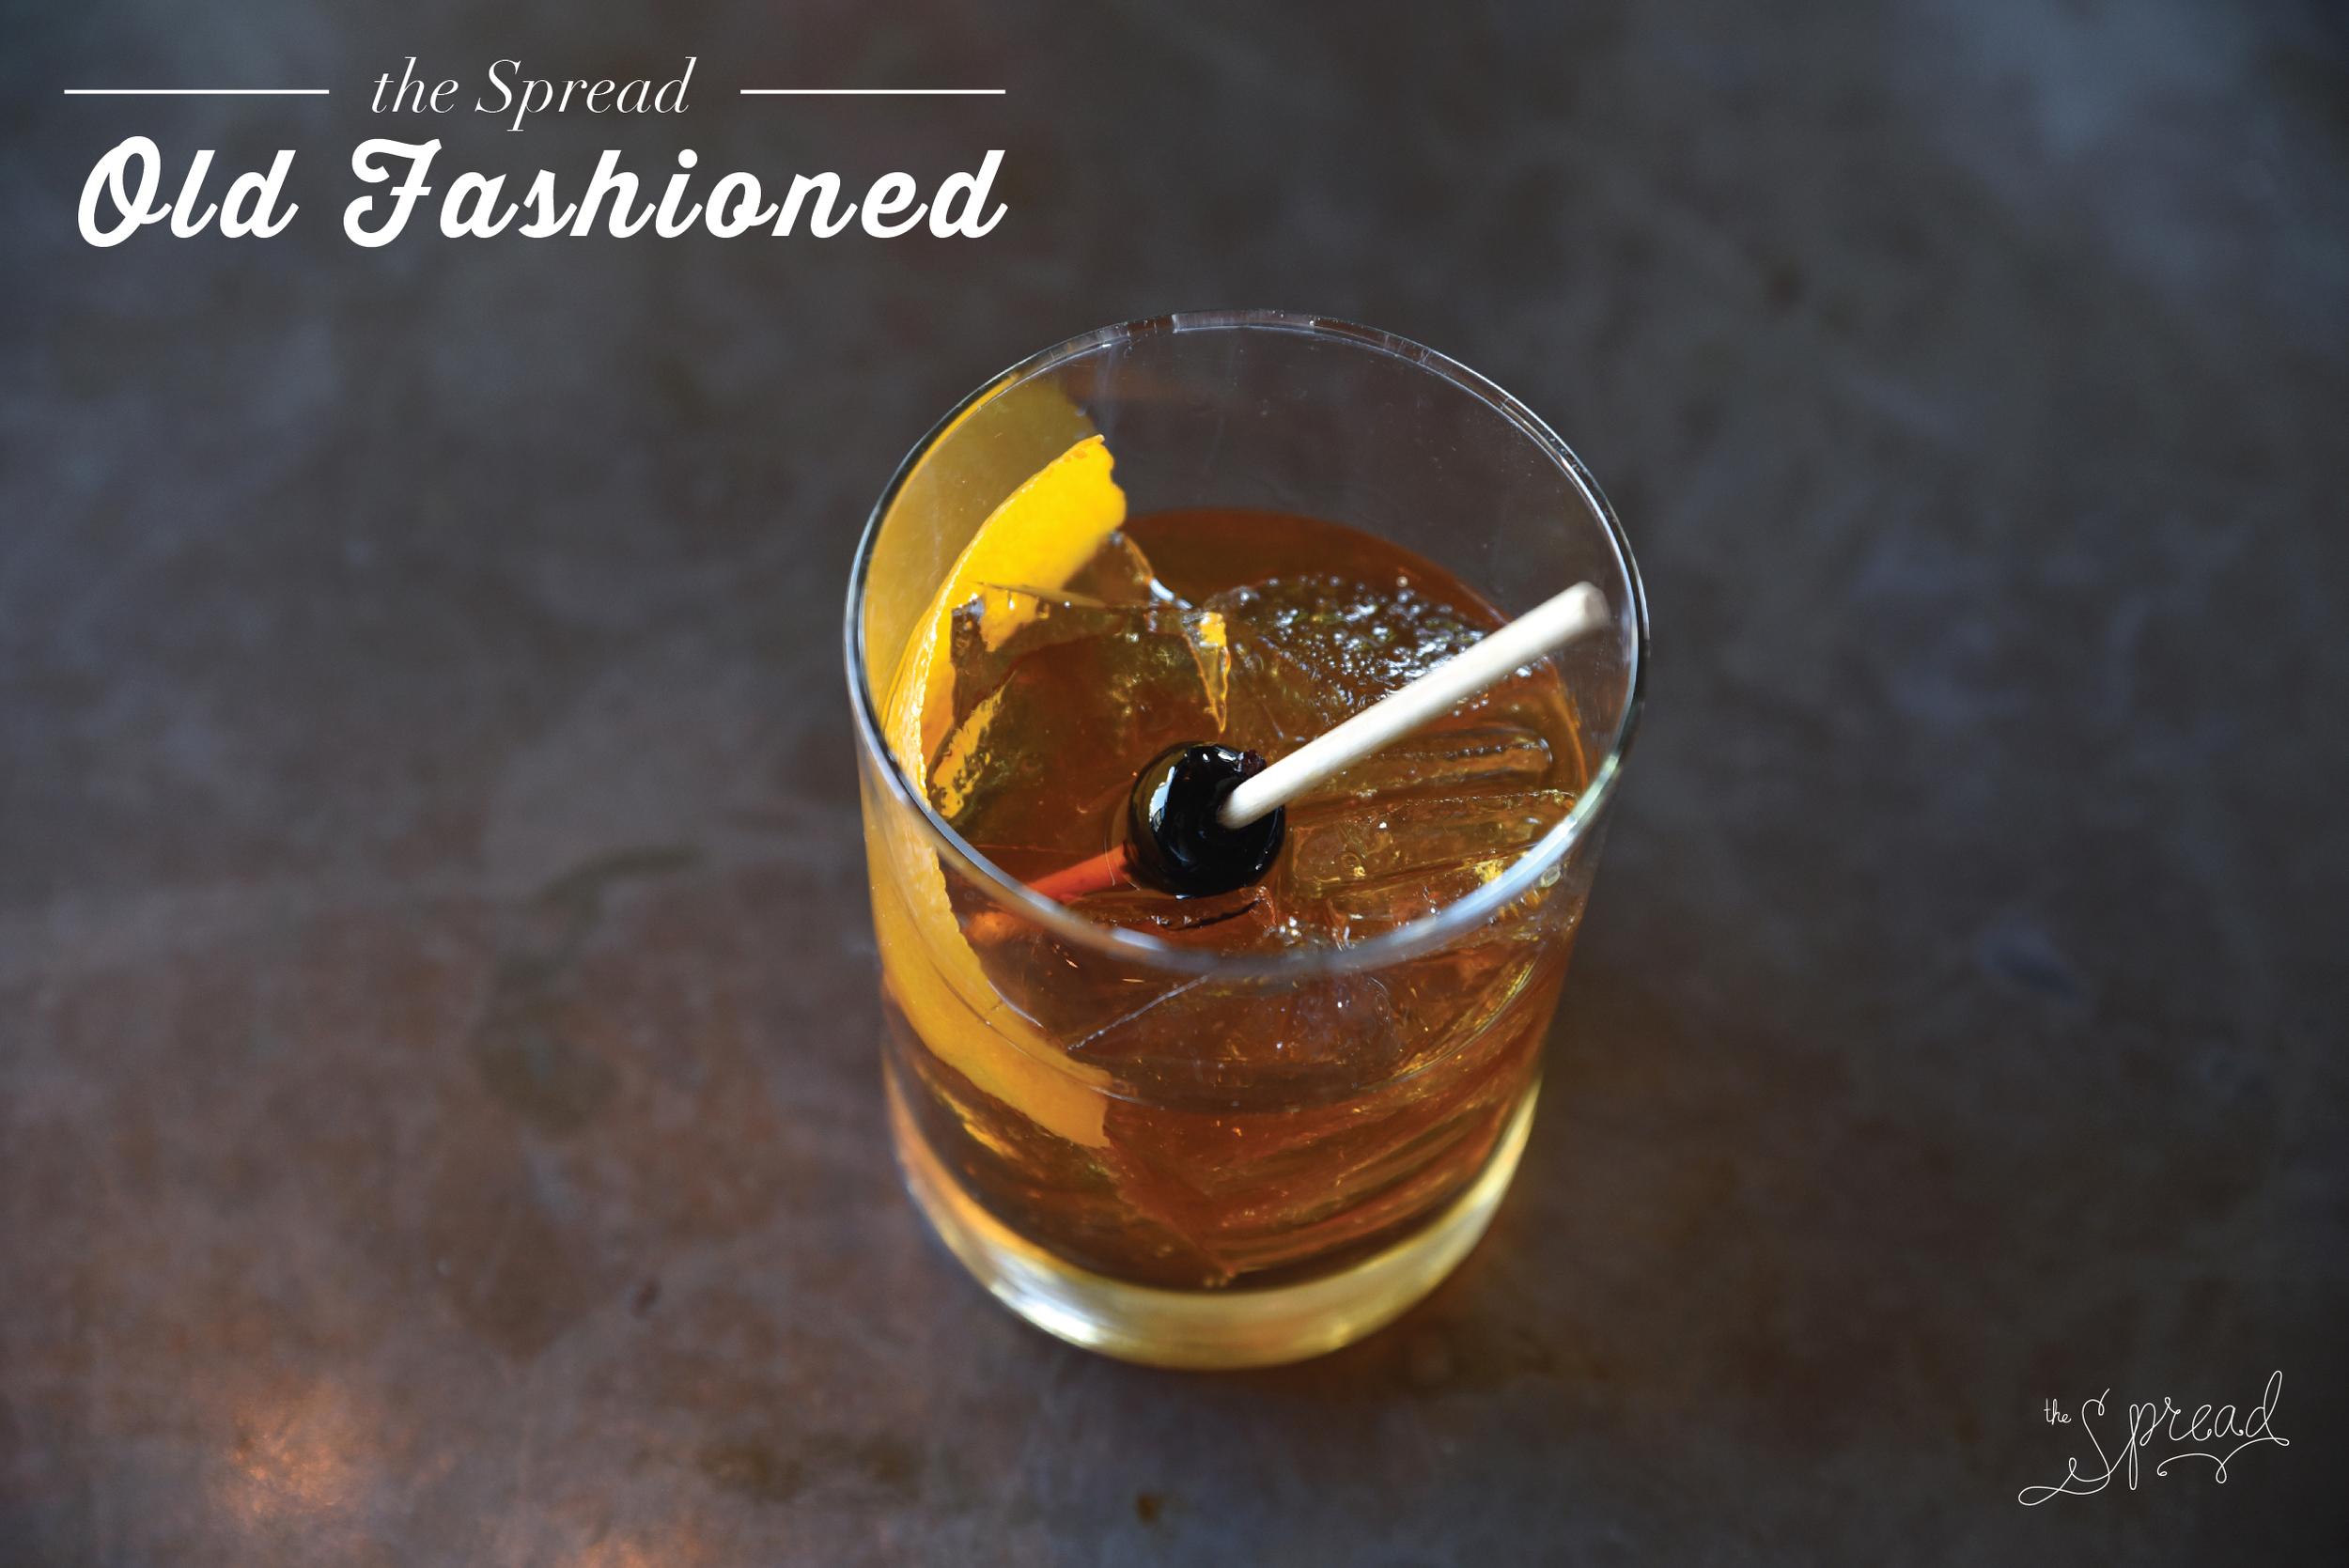 OldFashioned_Blog-01